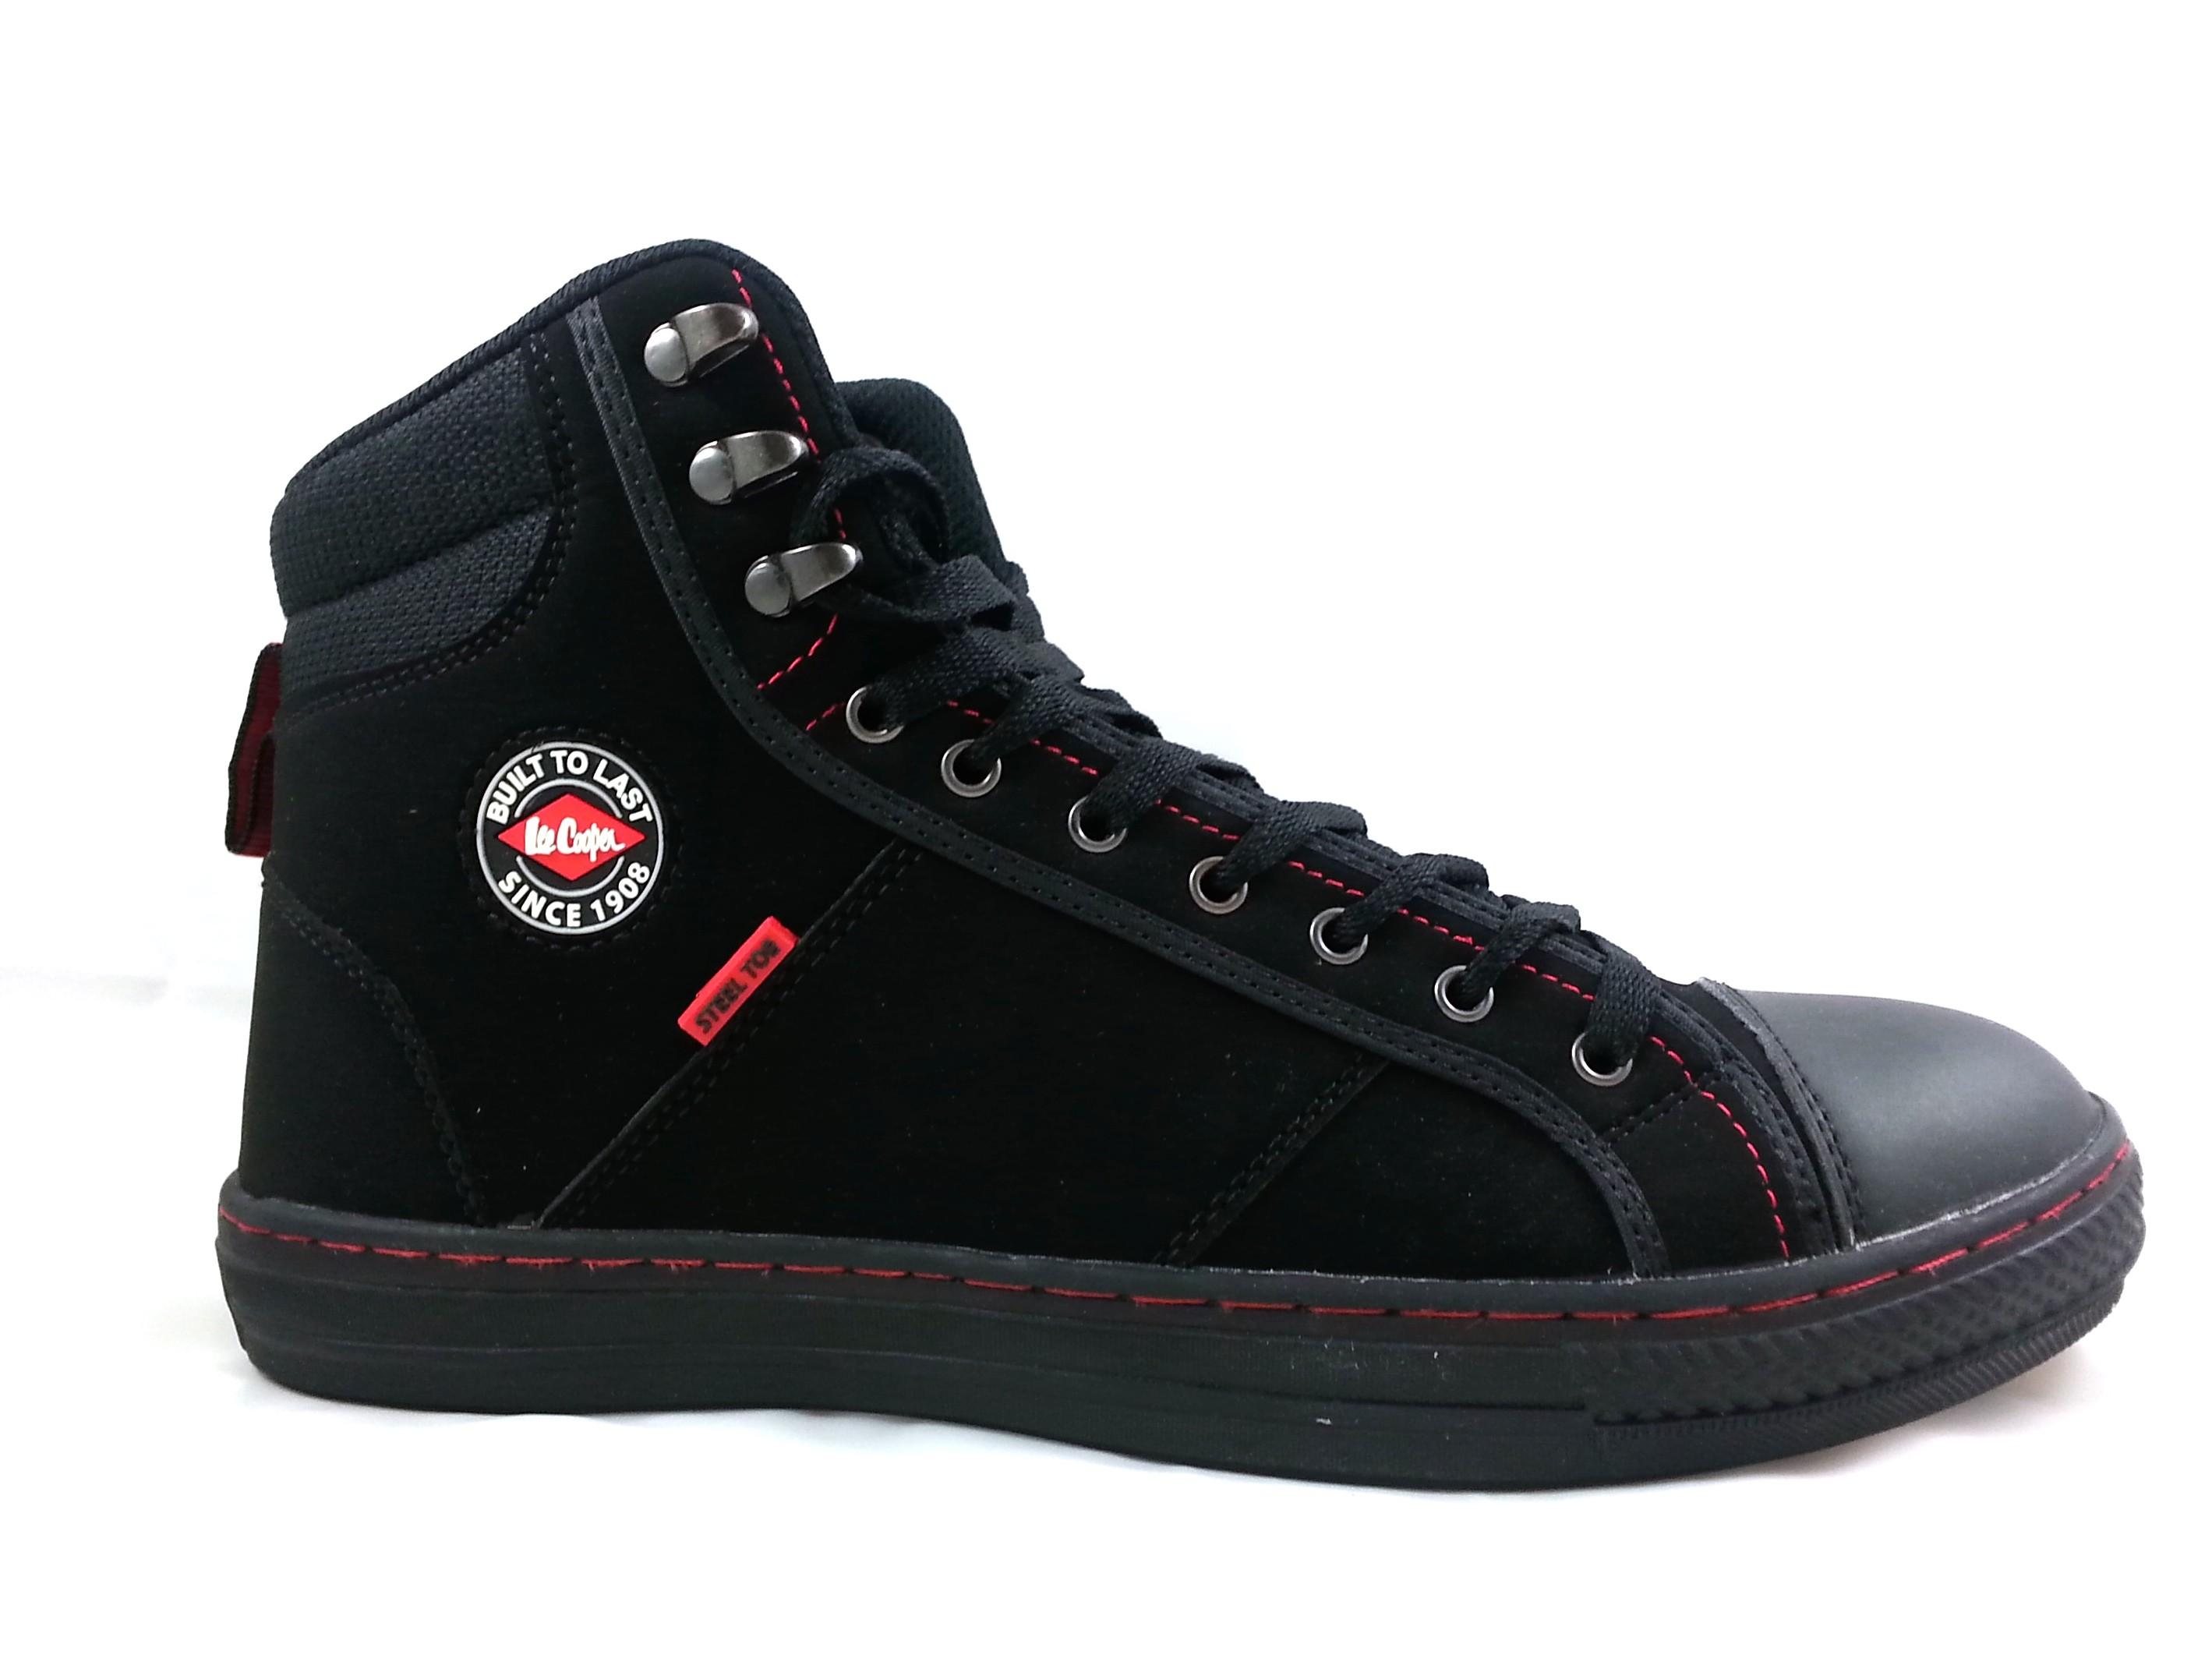 Chaussure de travail style...